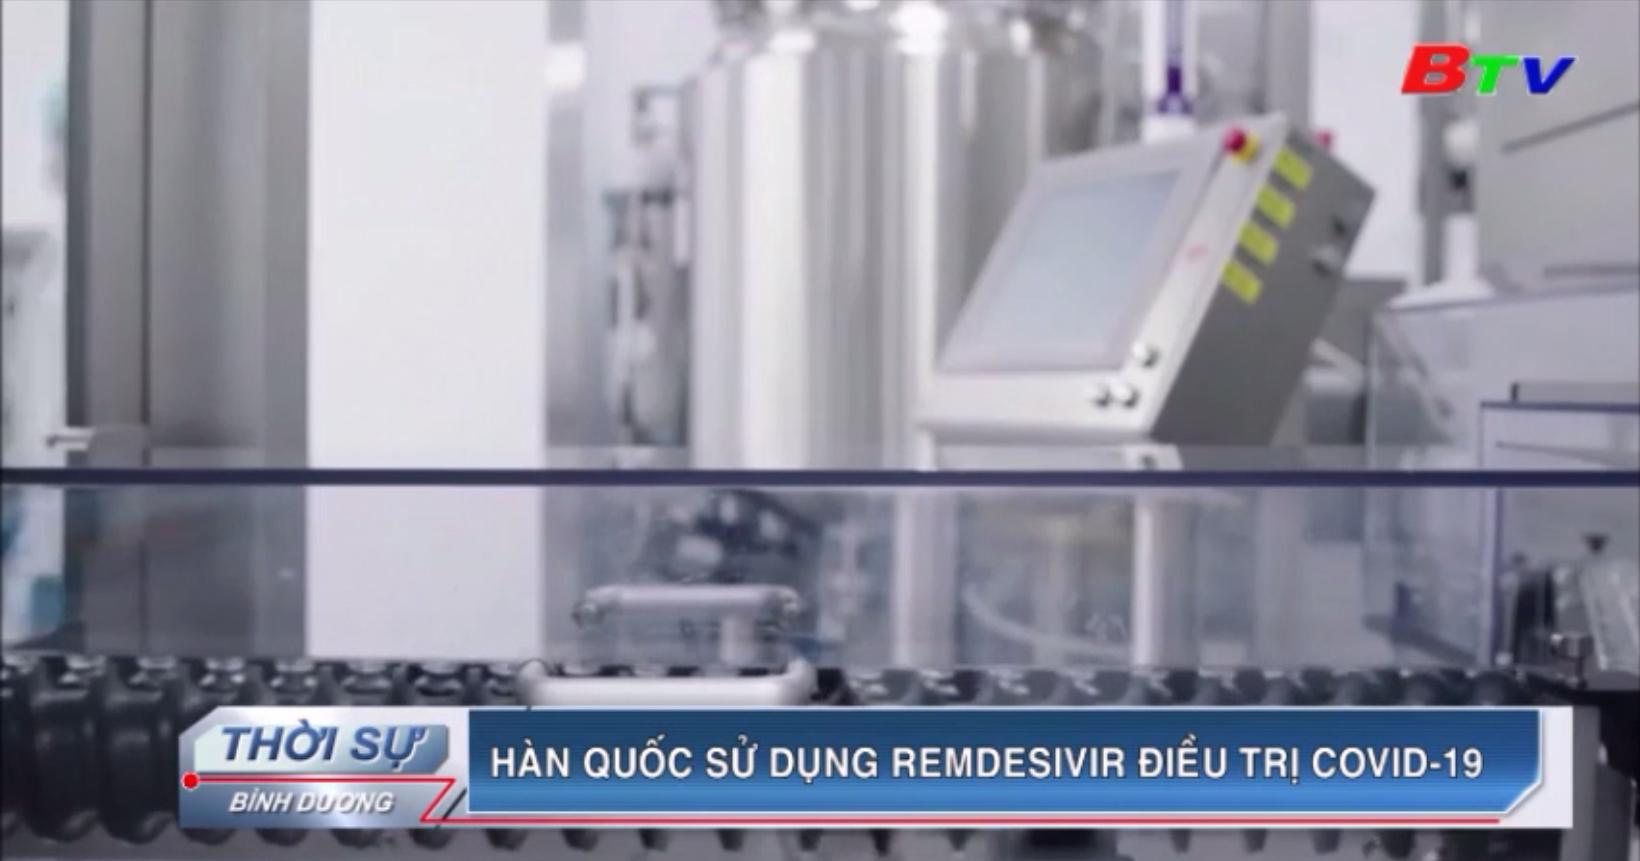 Hàn Quốc sử dụng Remdesivir điều trị Covid-19